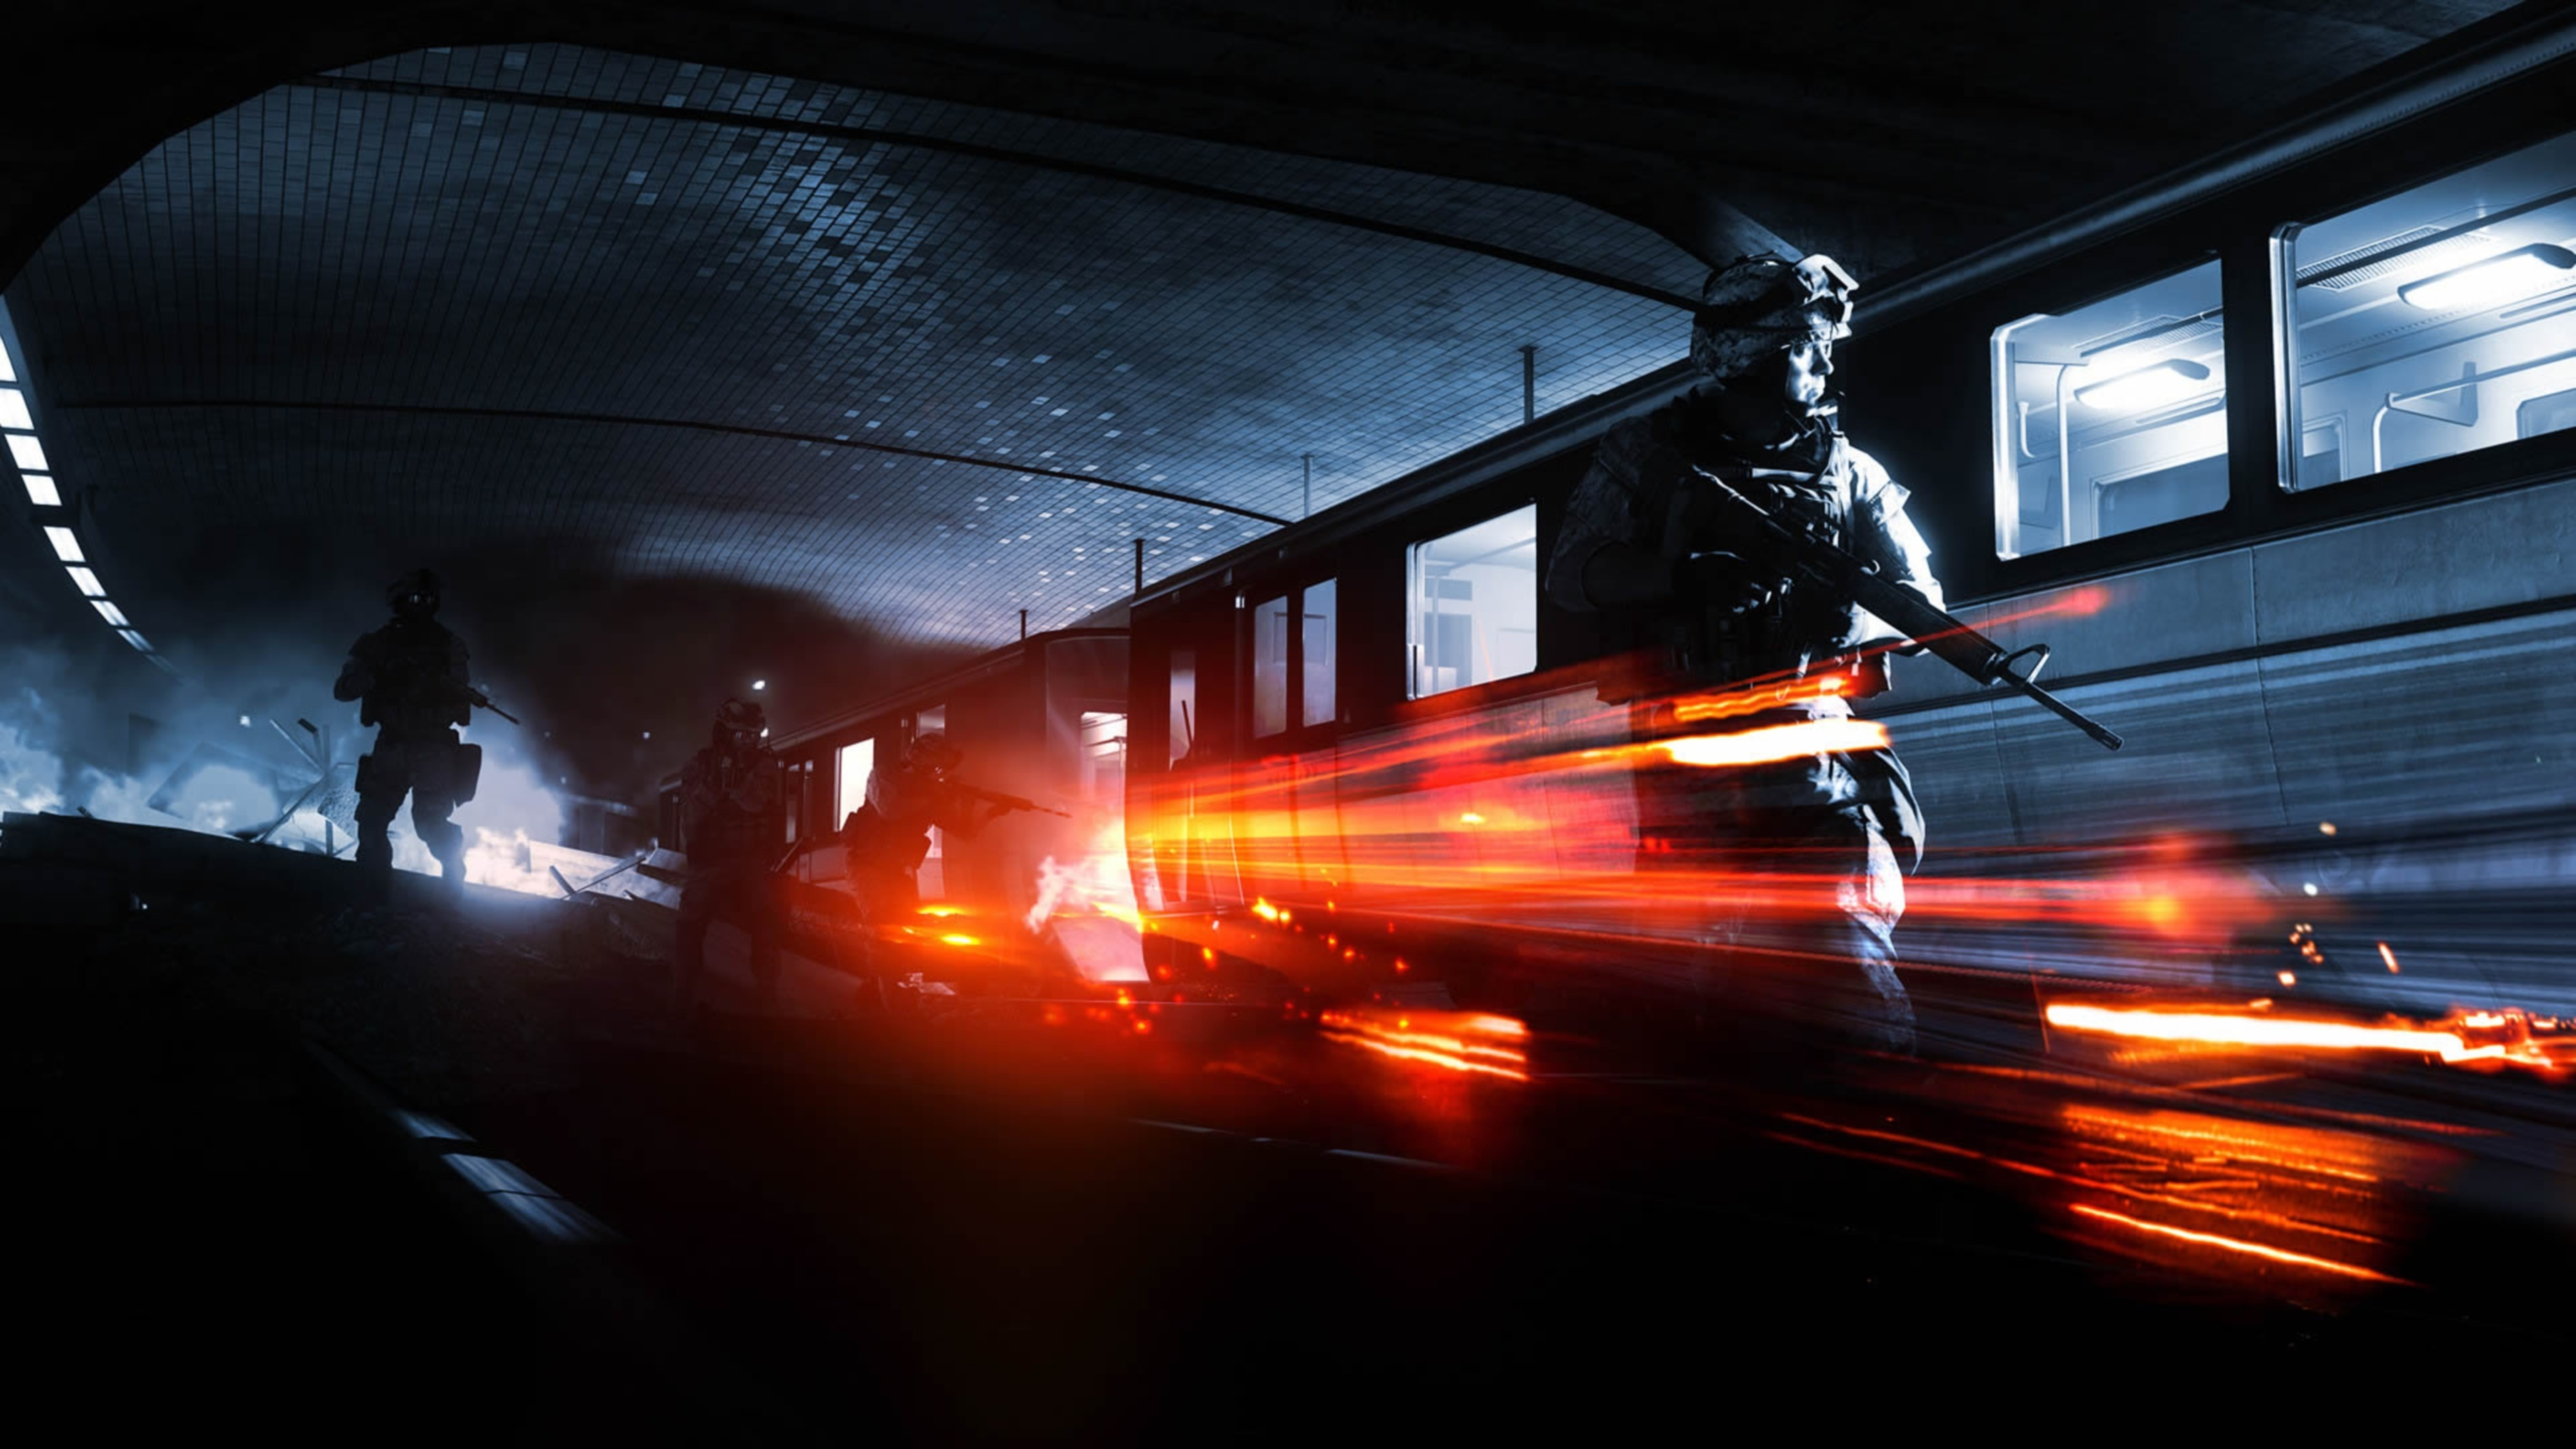 Обои Battlefield 3, игры, обои, картинки на ...: www.nastol.com.ua/look/11847-battlefield-3-igry-oboi-kartinki.html